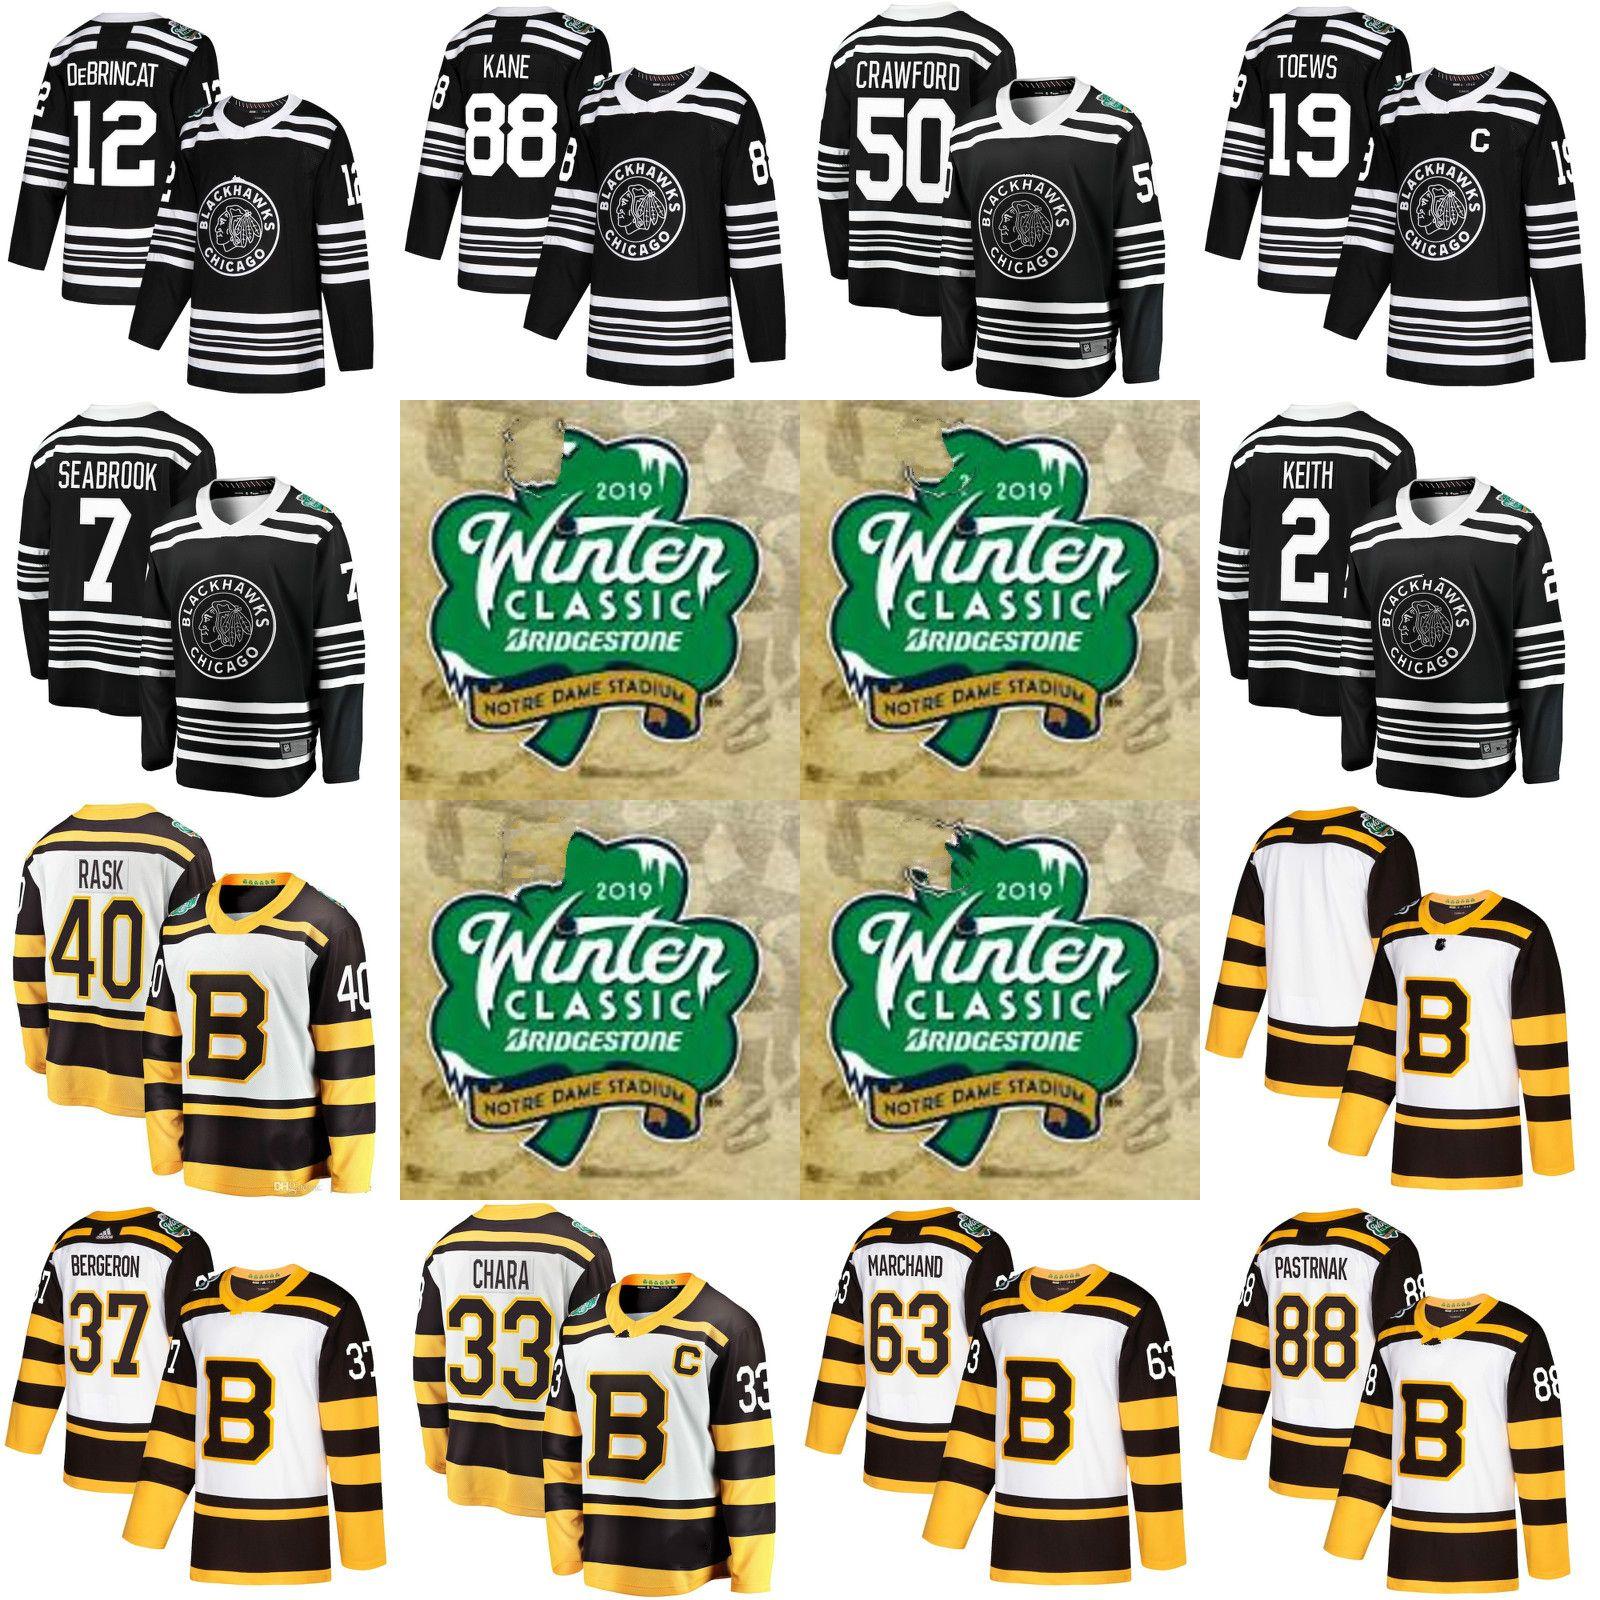 2019 Custom Boston Bruins Chicago Blackhawks 2019 Winter Classic Hockey  Jersey Duncan Keith Toews Corey Crawford Patrick Kane Notre Dame Stadium  From ... 2d955fc8a